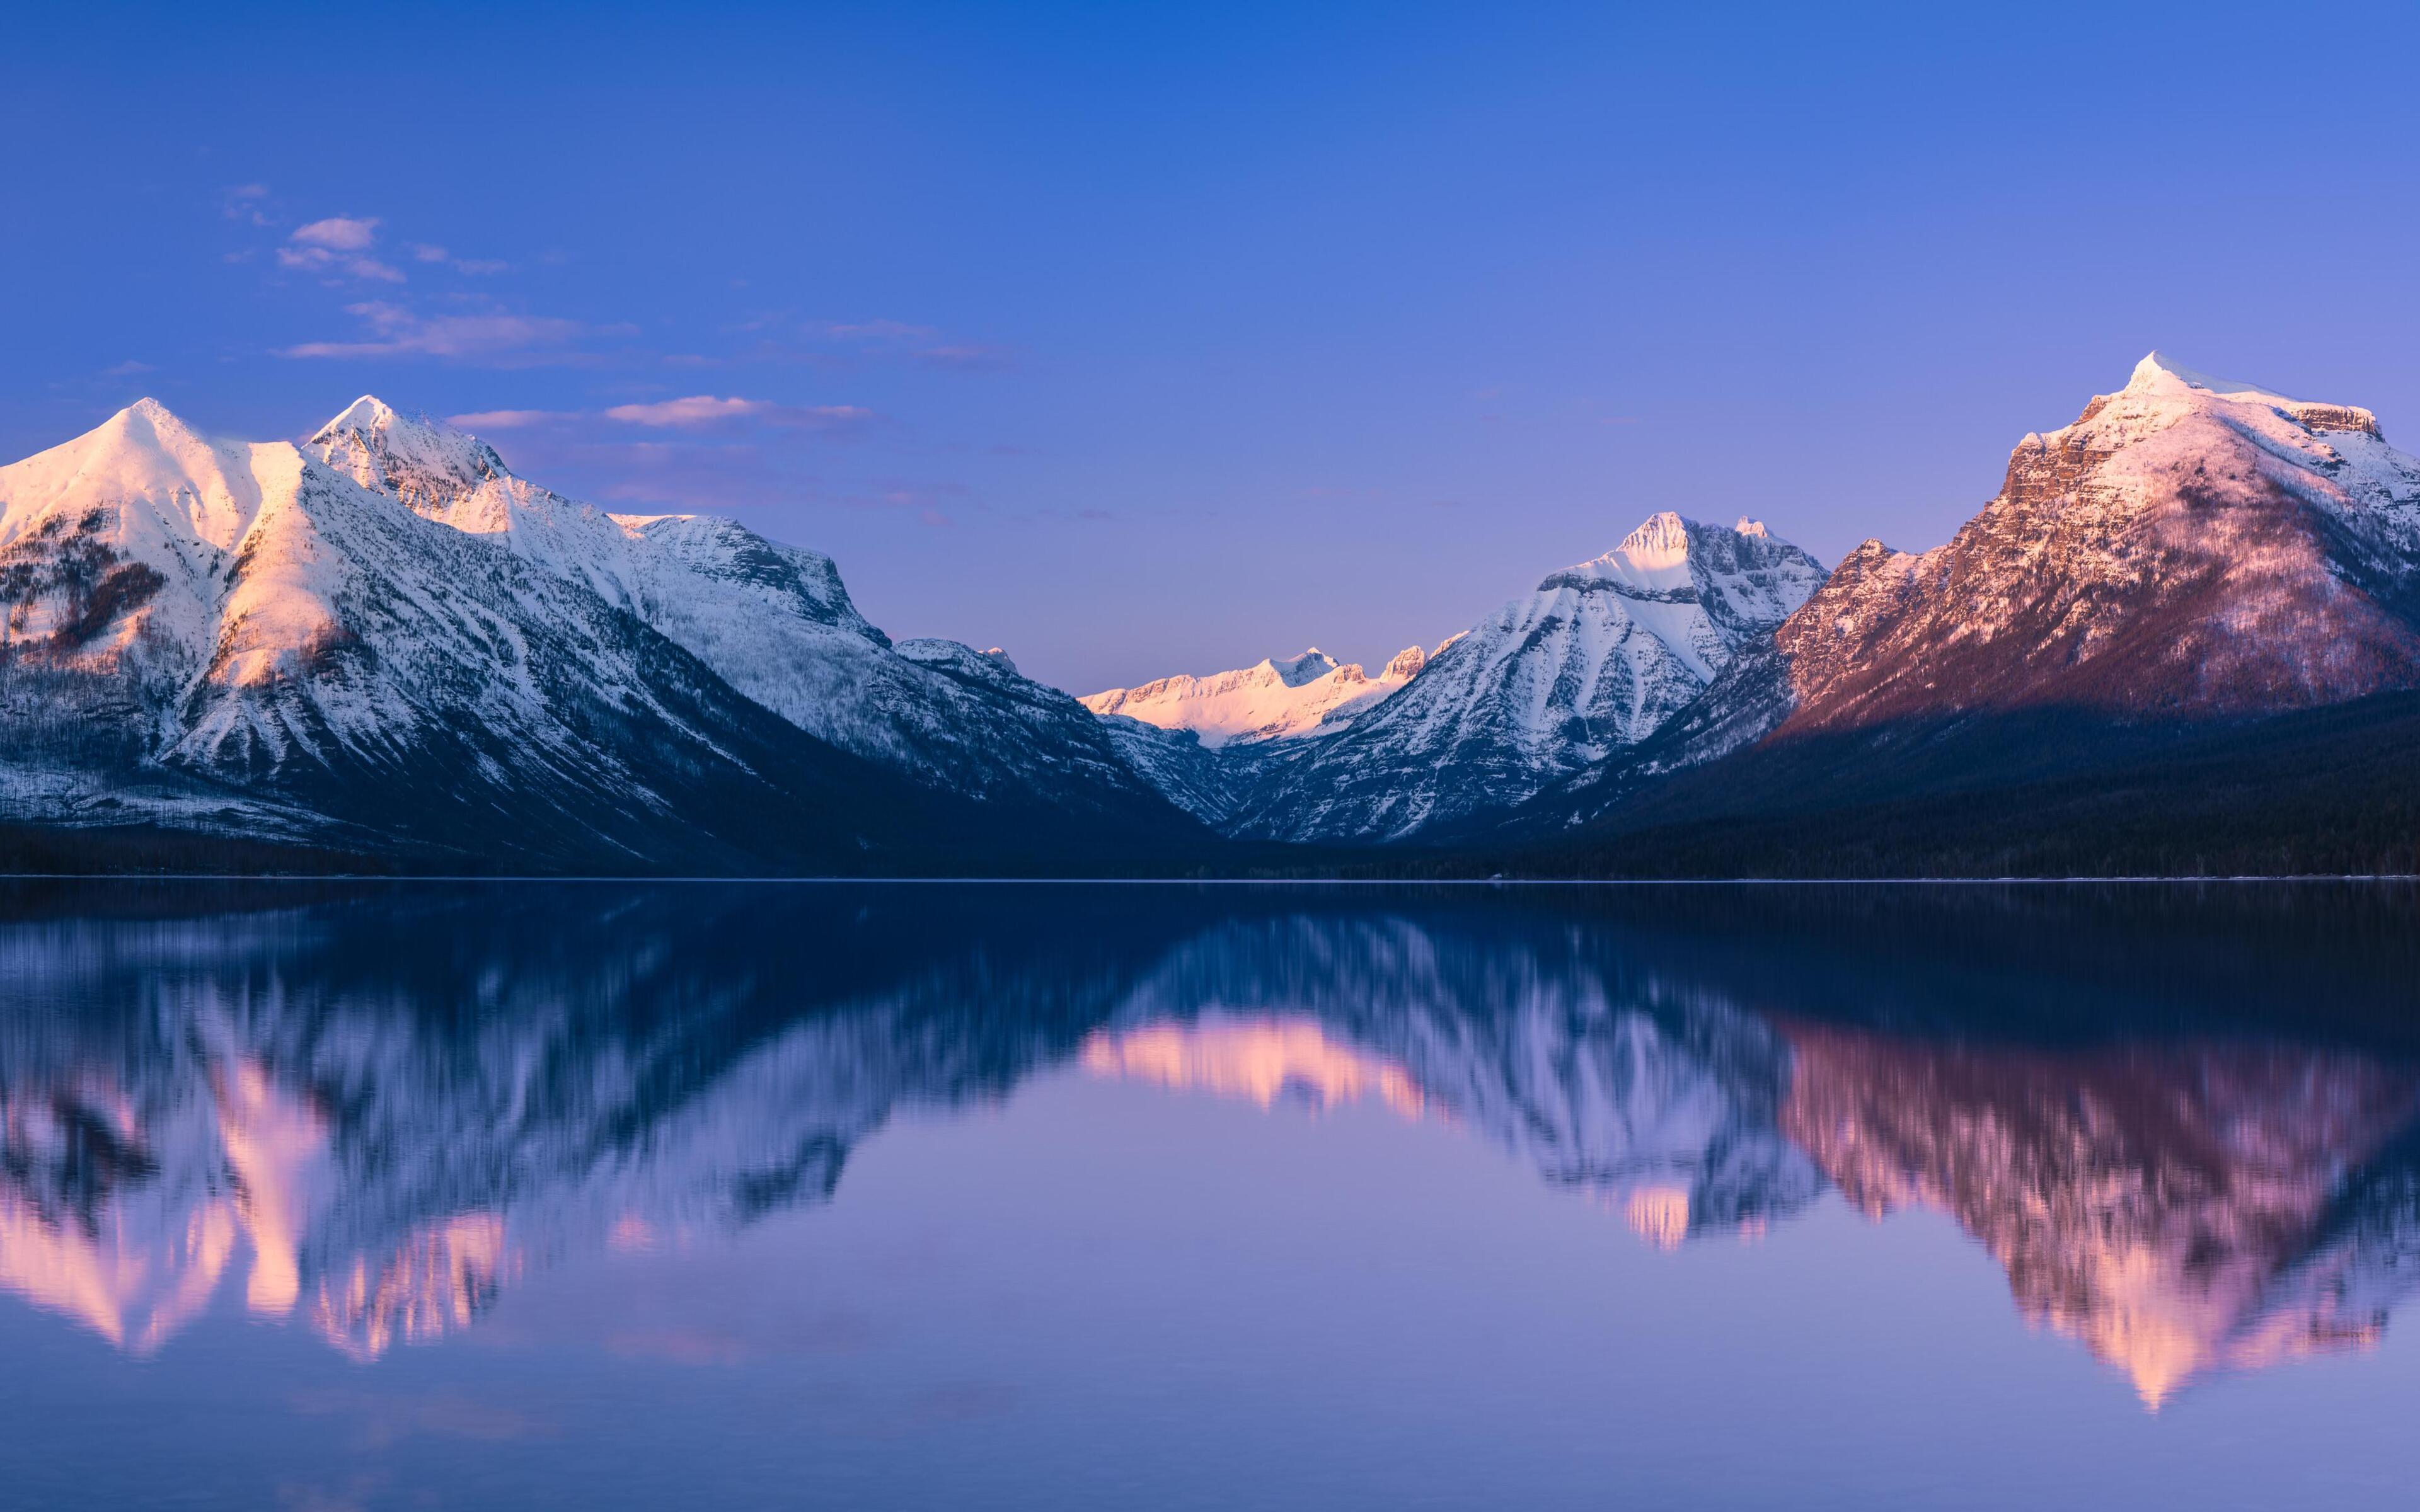 mcdonald-lake-glacier-national-park-5k-ba.jpg